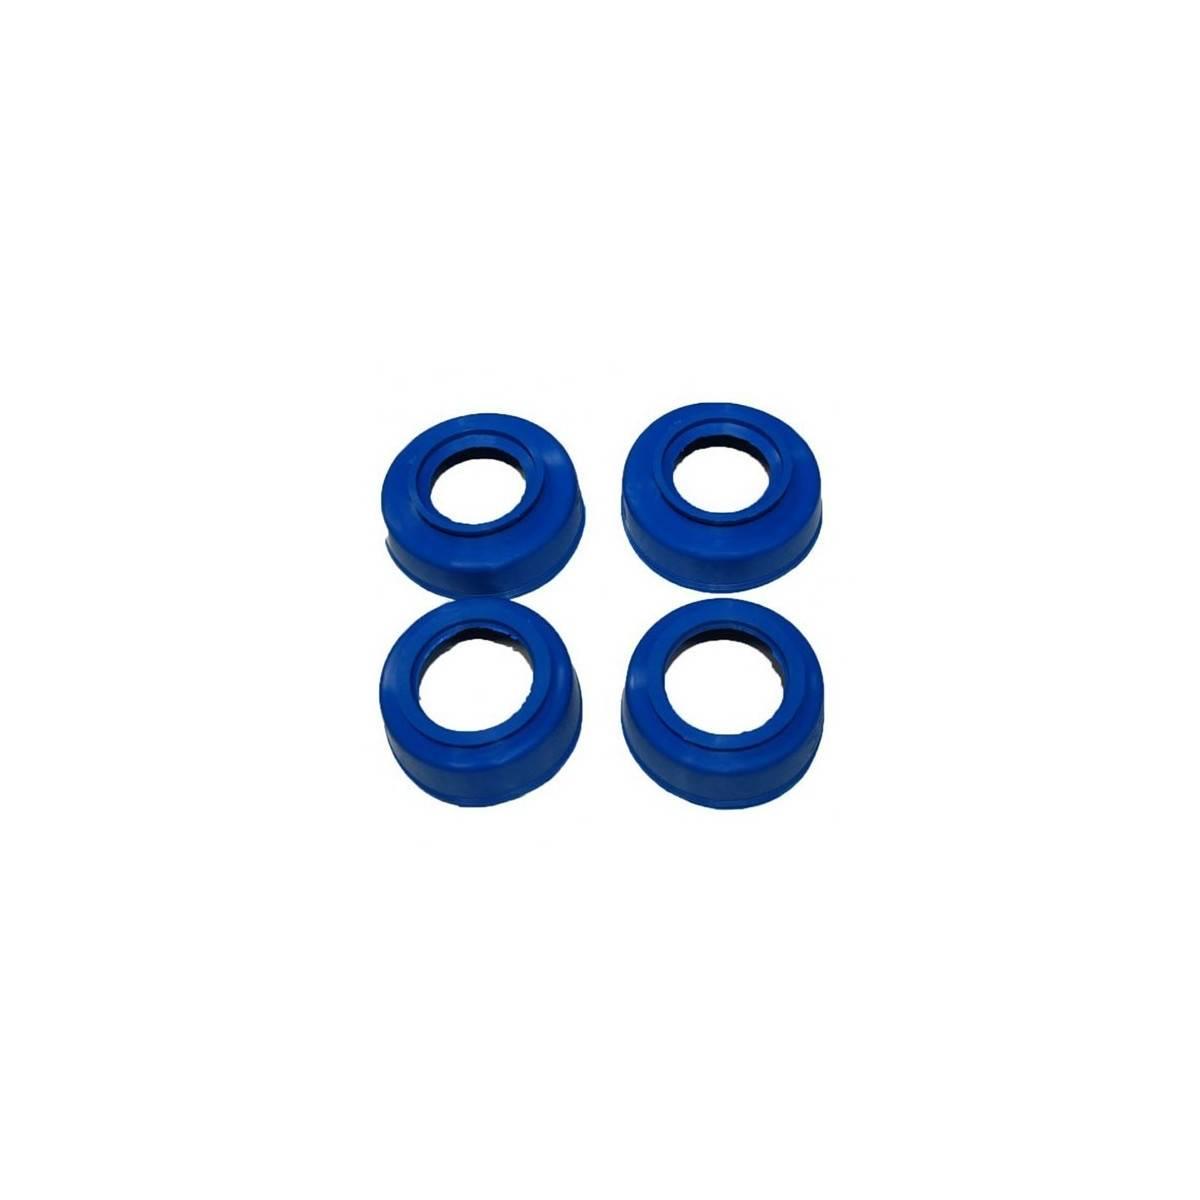 4MXBP02-AZ - Guardapolvos Cojinete Rueda Ktm 16 17 Hva 14... Azul